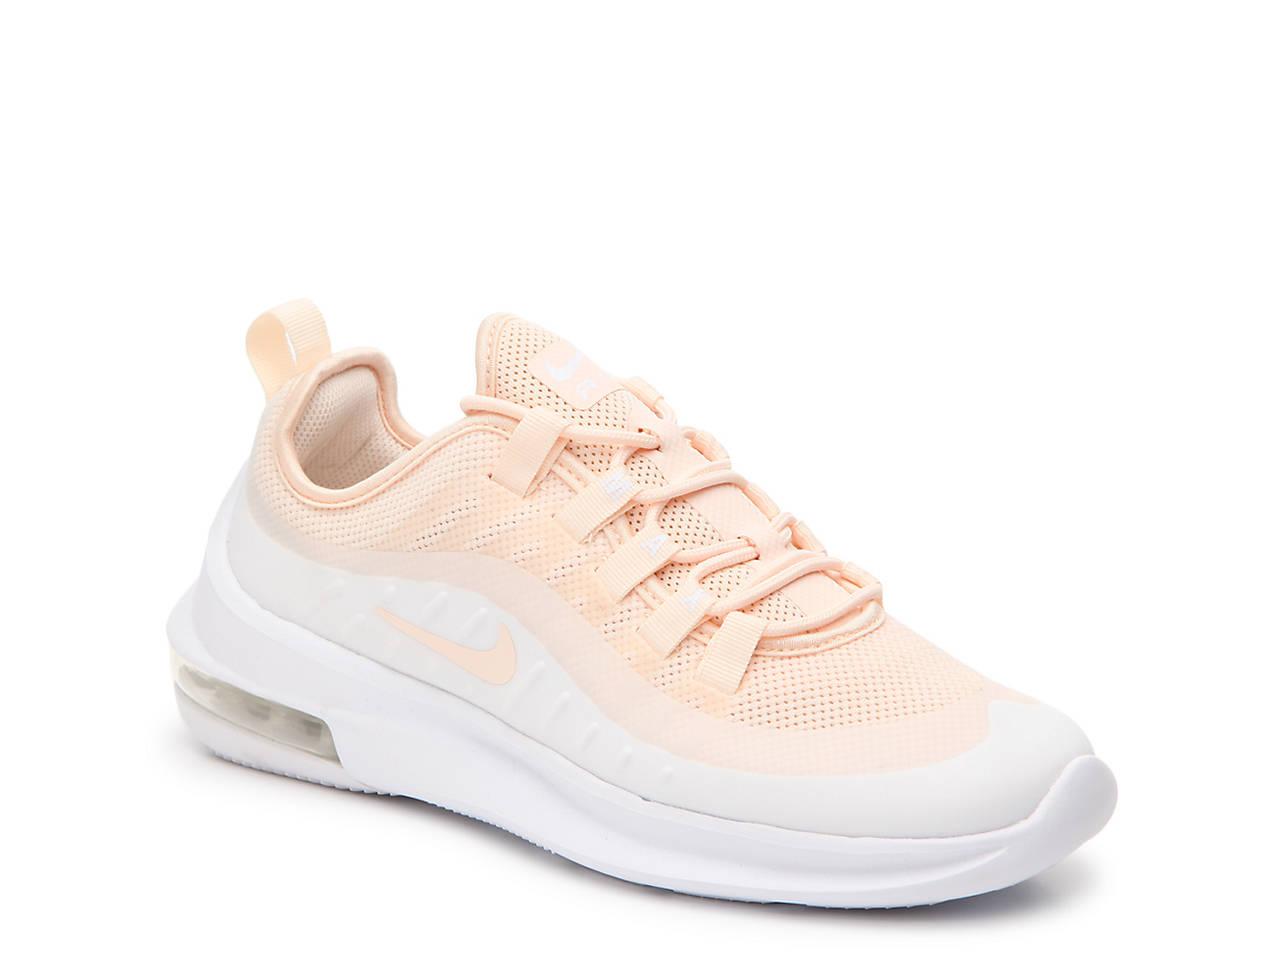 Nike Air Max Axis Sneaker - Women s Women s Shoes  1fcbc6936d9